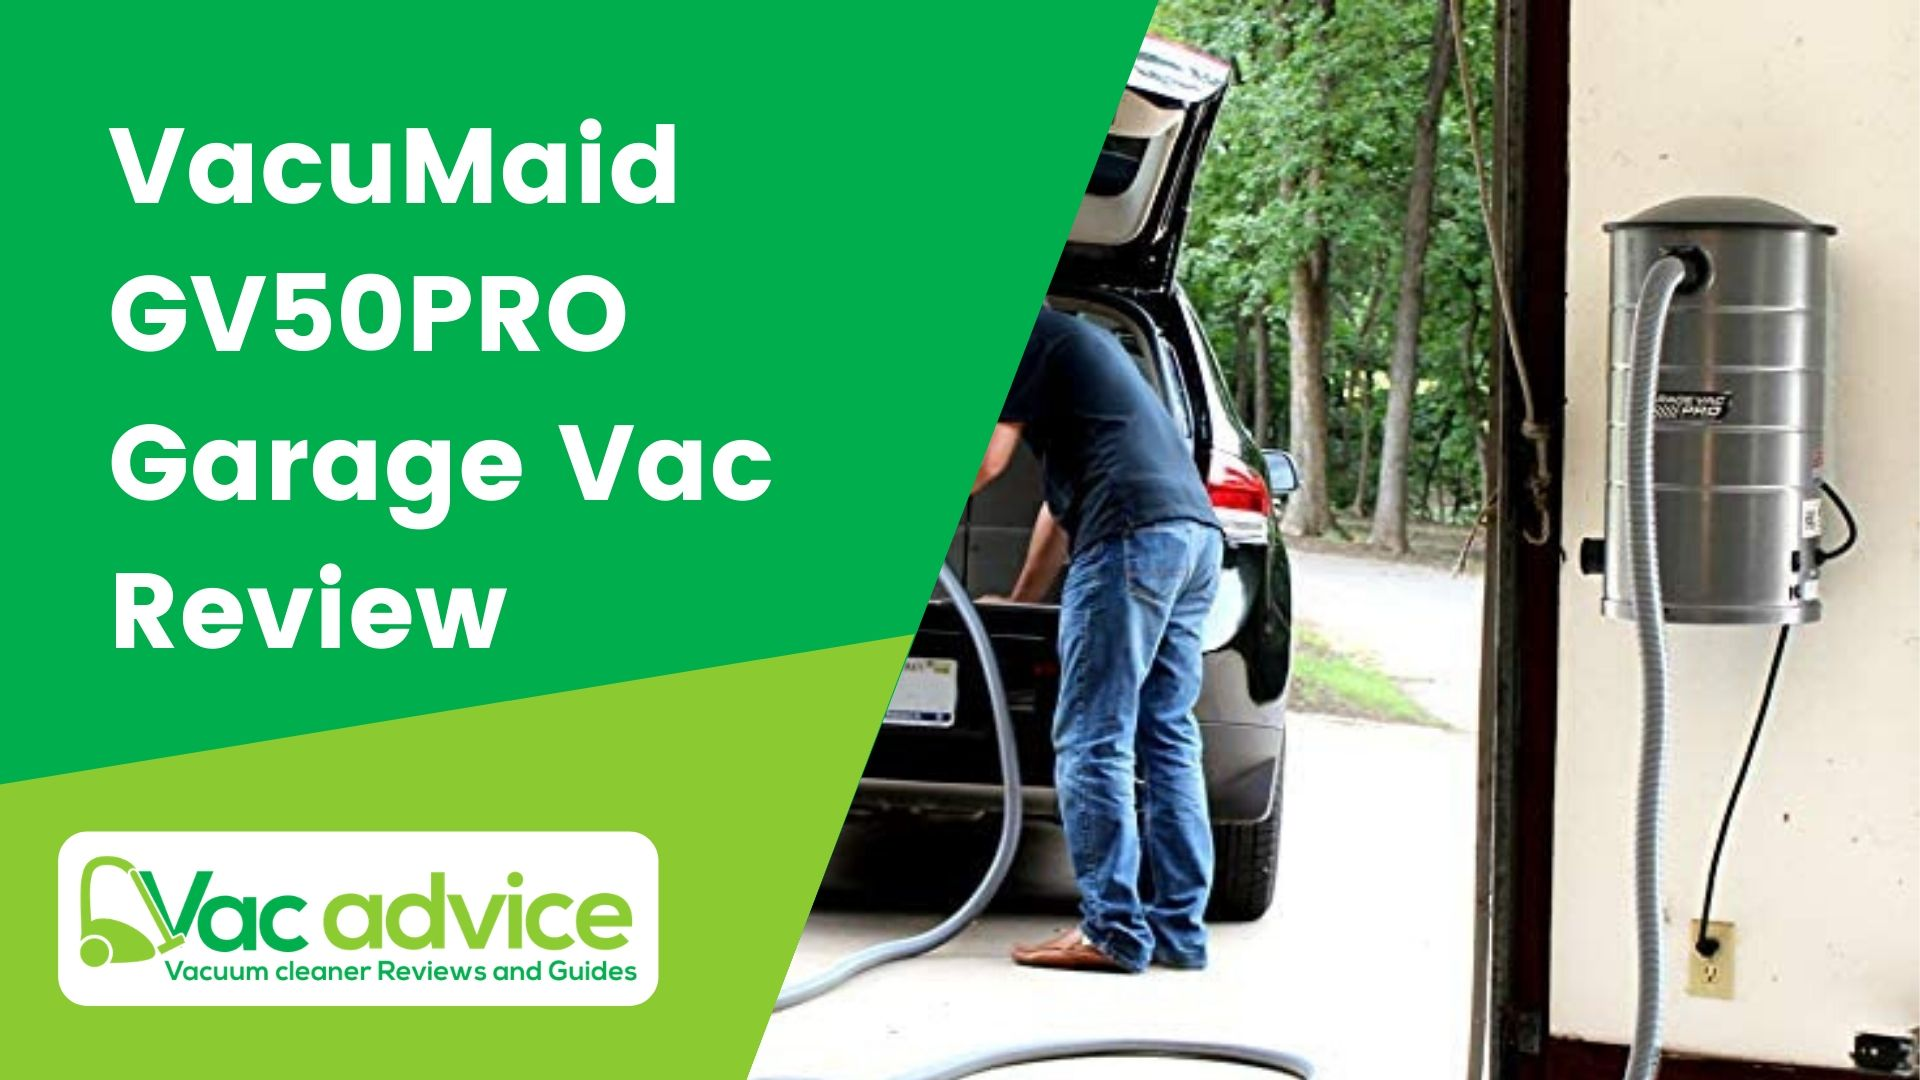 VacuMaid GV50PRO Review